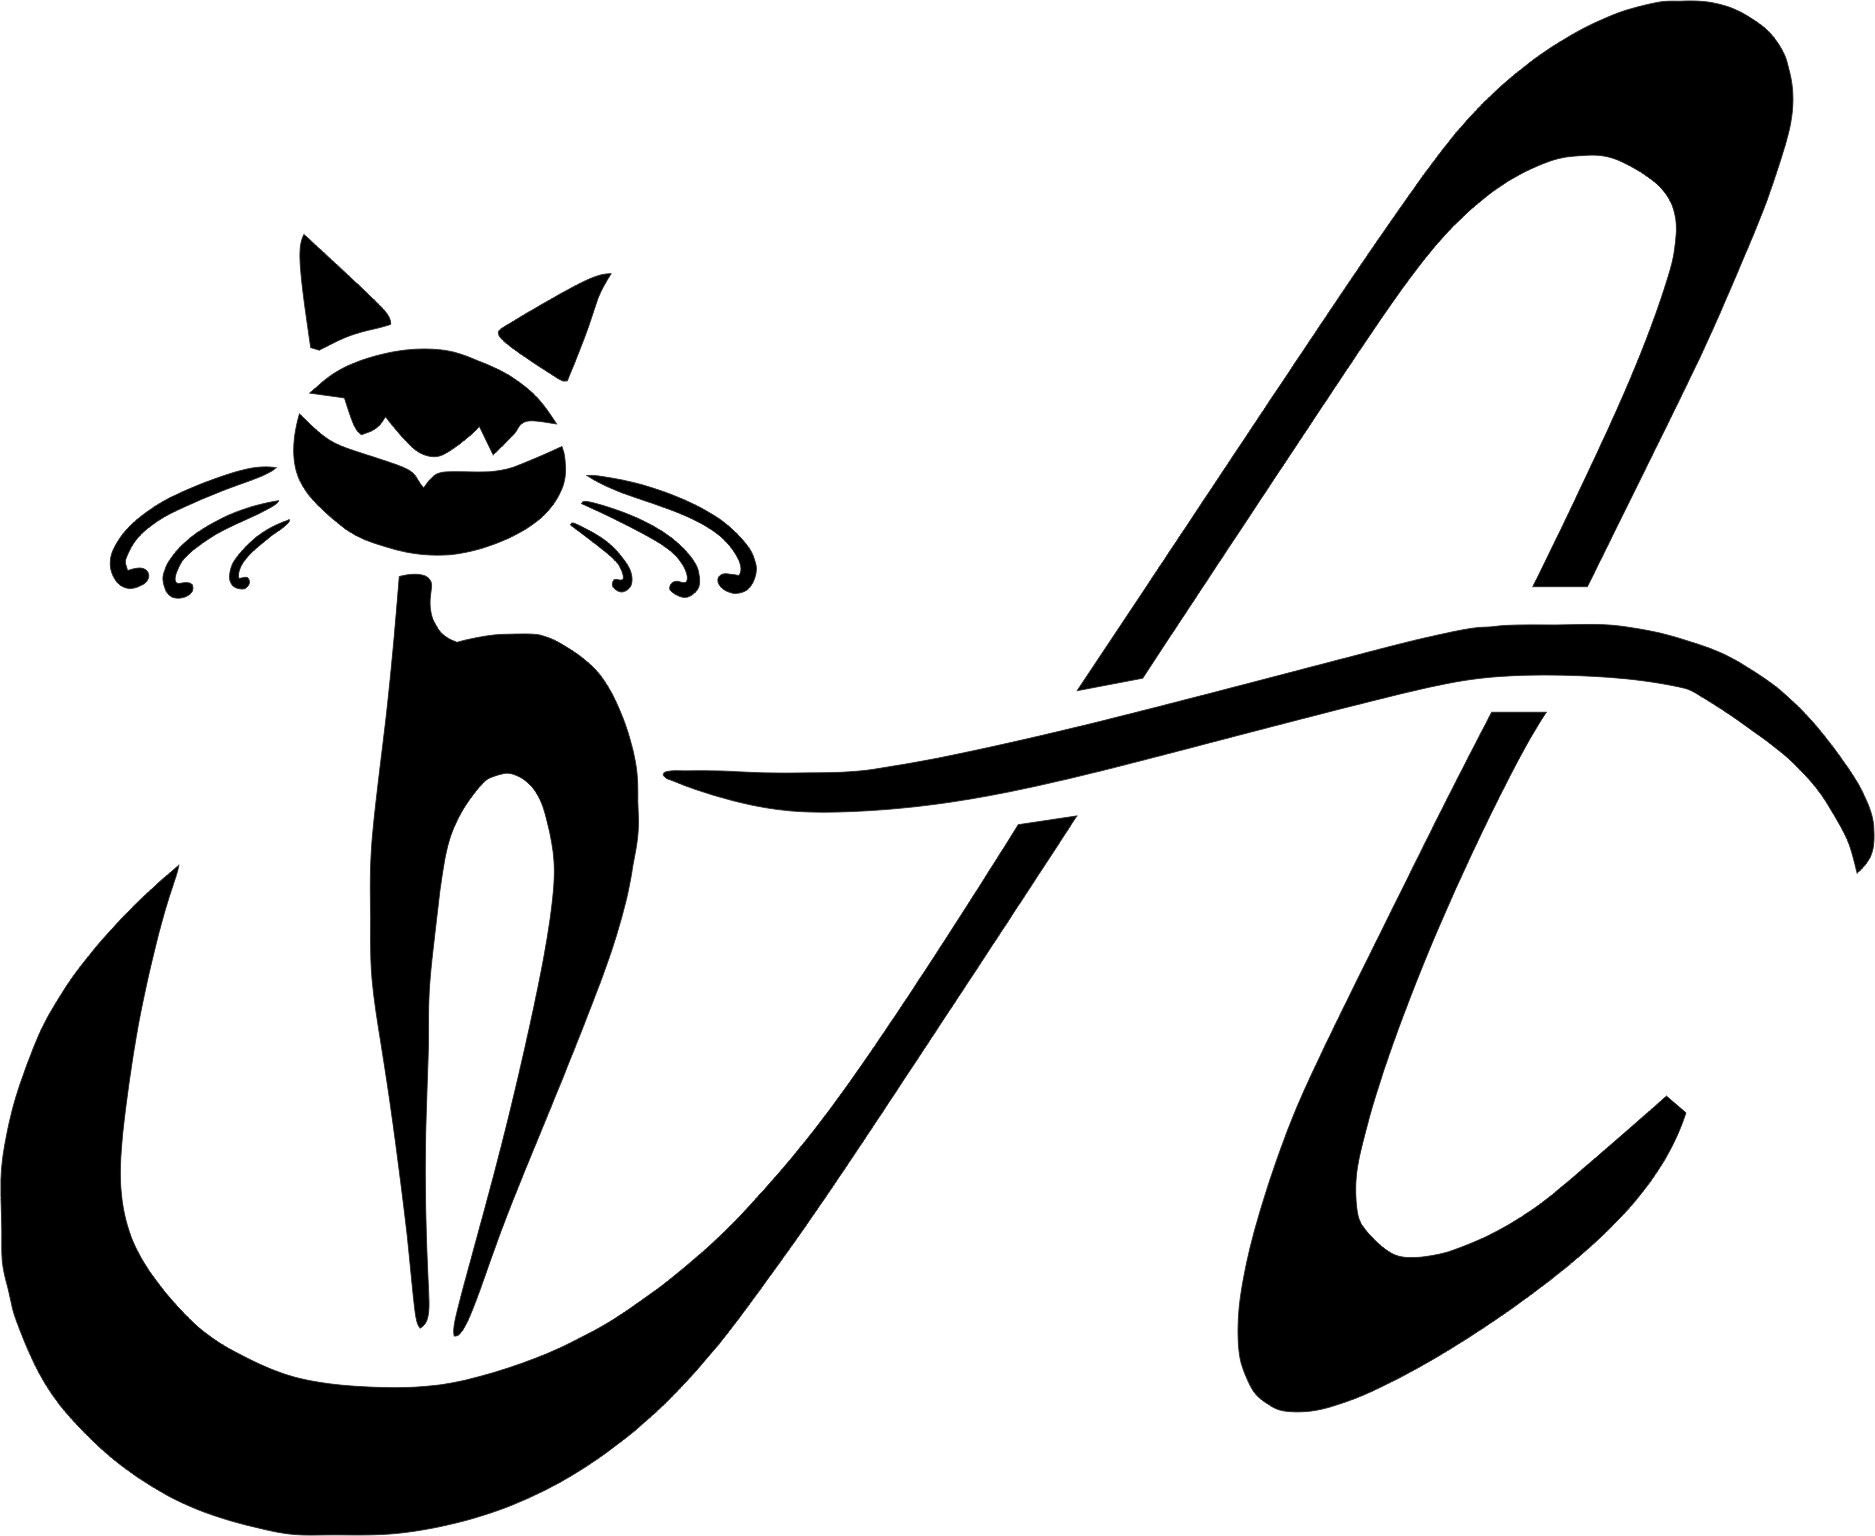 stencil schablone a-katze | Ч-Б КАРТИНКИ | pinterest | shopping